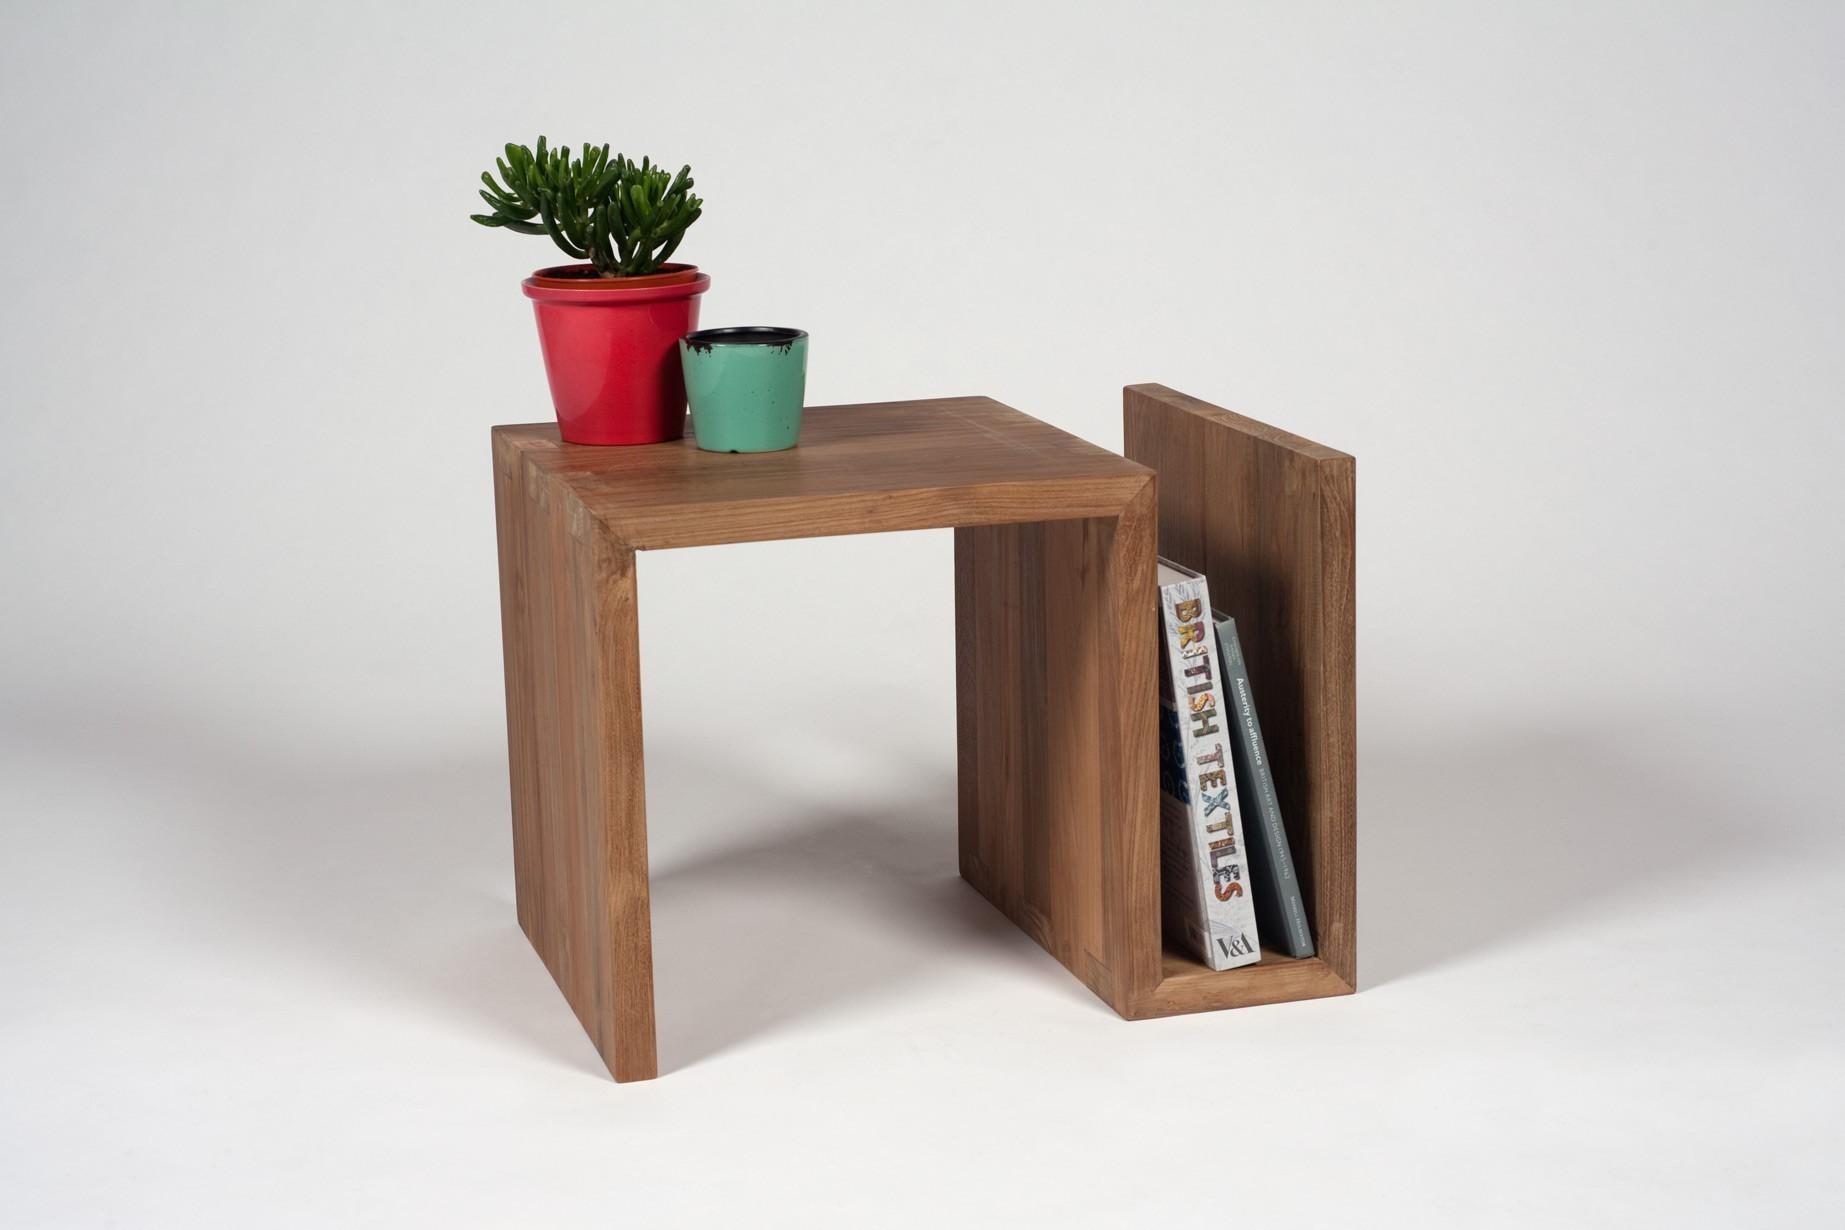 Side Tables Office For Drawing Wooden Diy Bedside Decor Bedroom